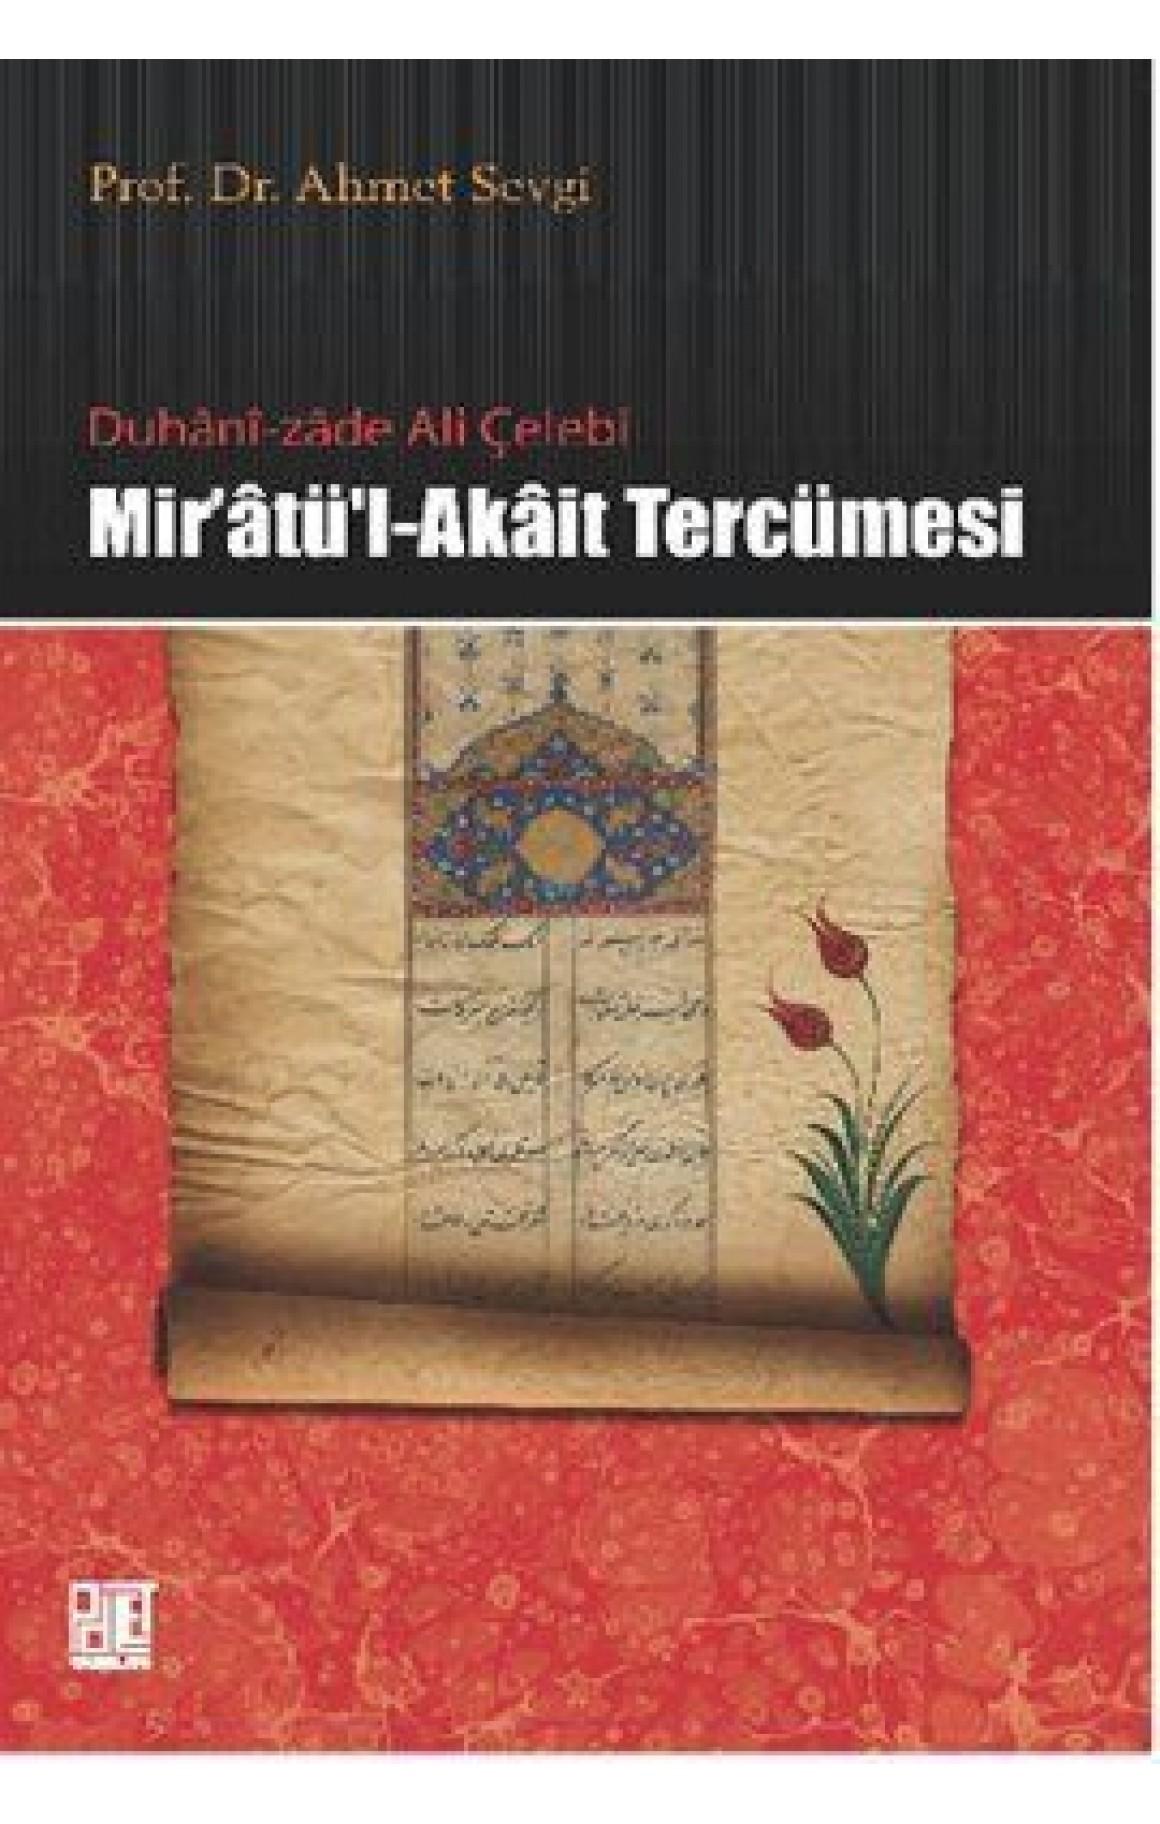 Duhani-zade Ali Çelebi Miratül-Akait Tercümesi